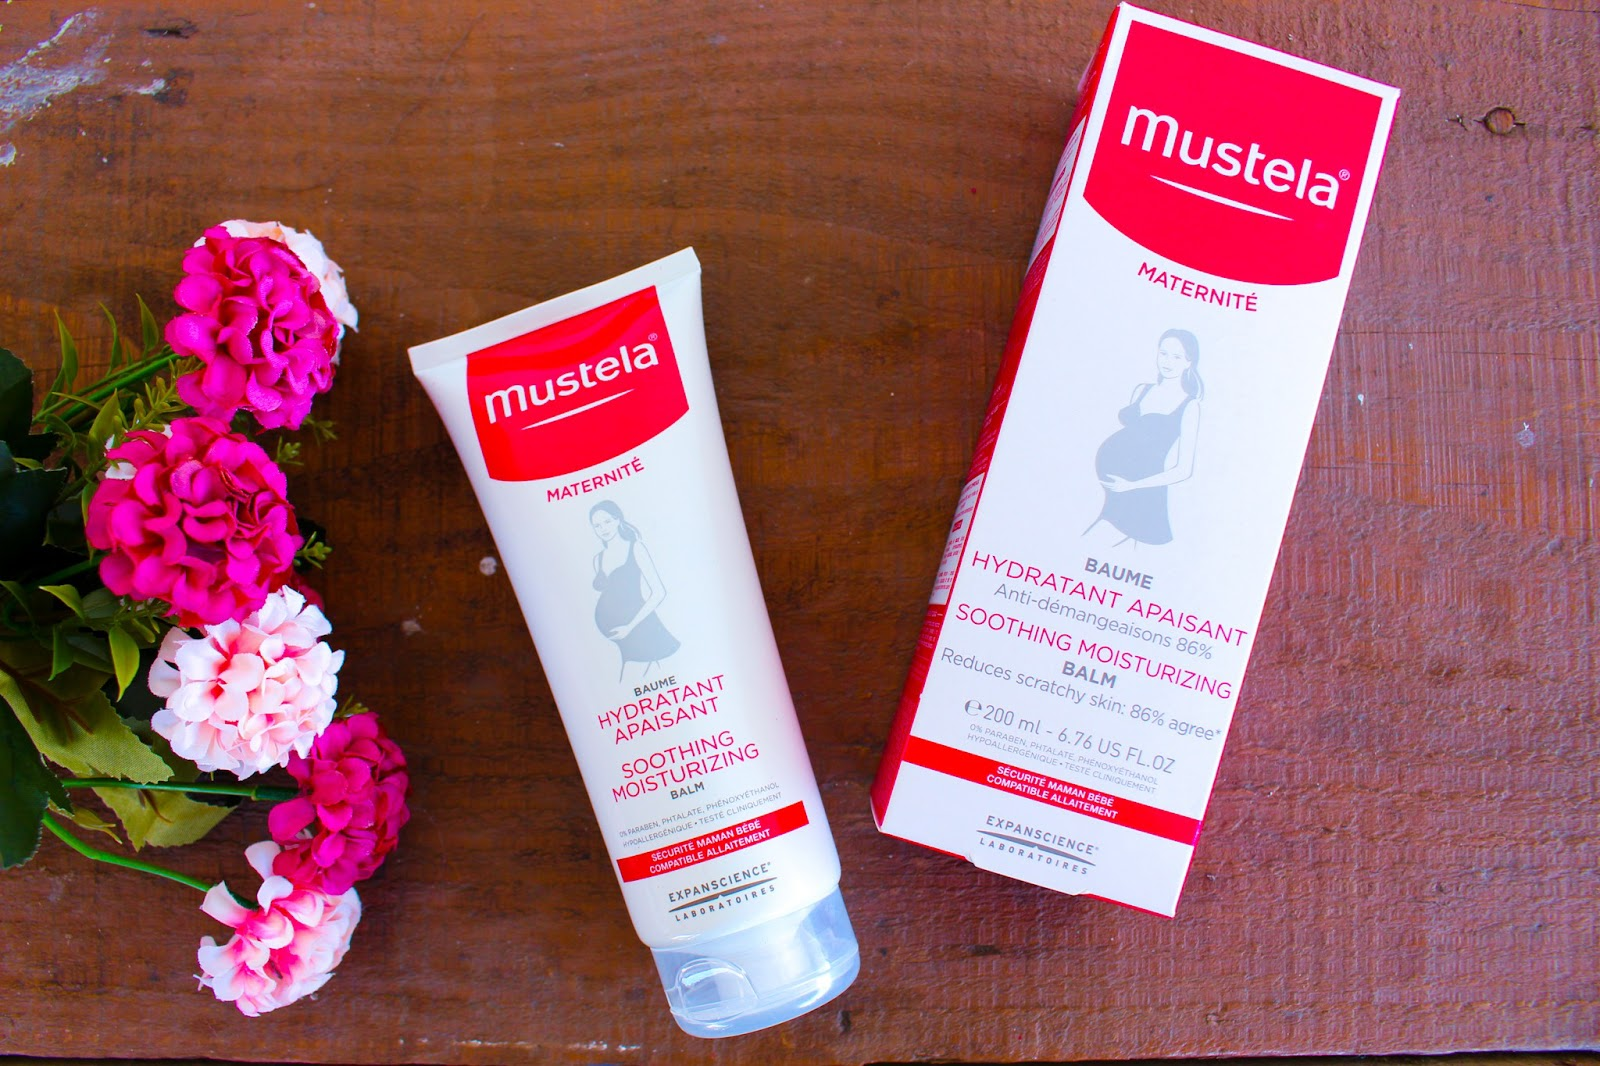 Resenha: Mustela Maternité Balsamo Hidratante